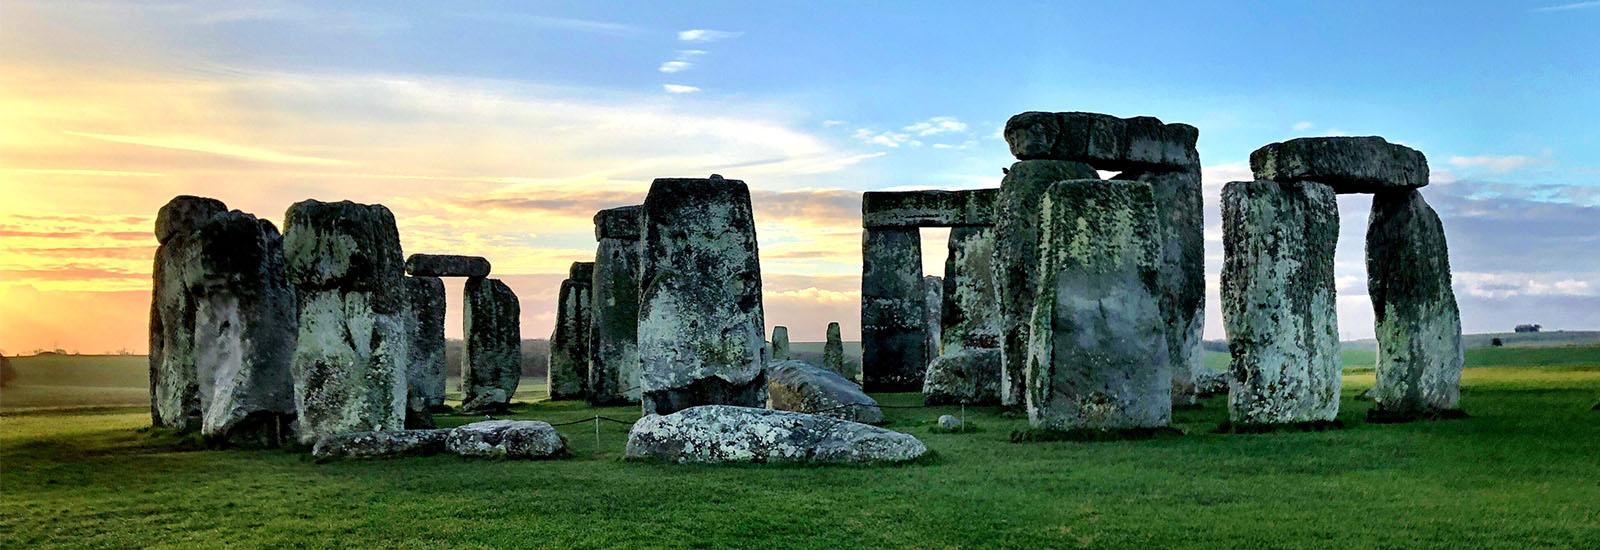 Tour Stonehenge - Excursion and Tour Guide